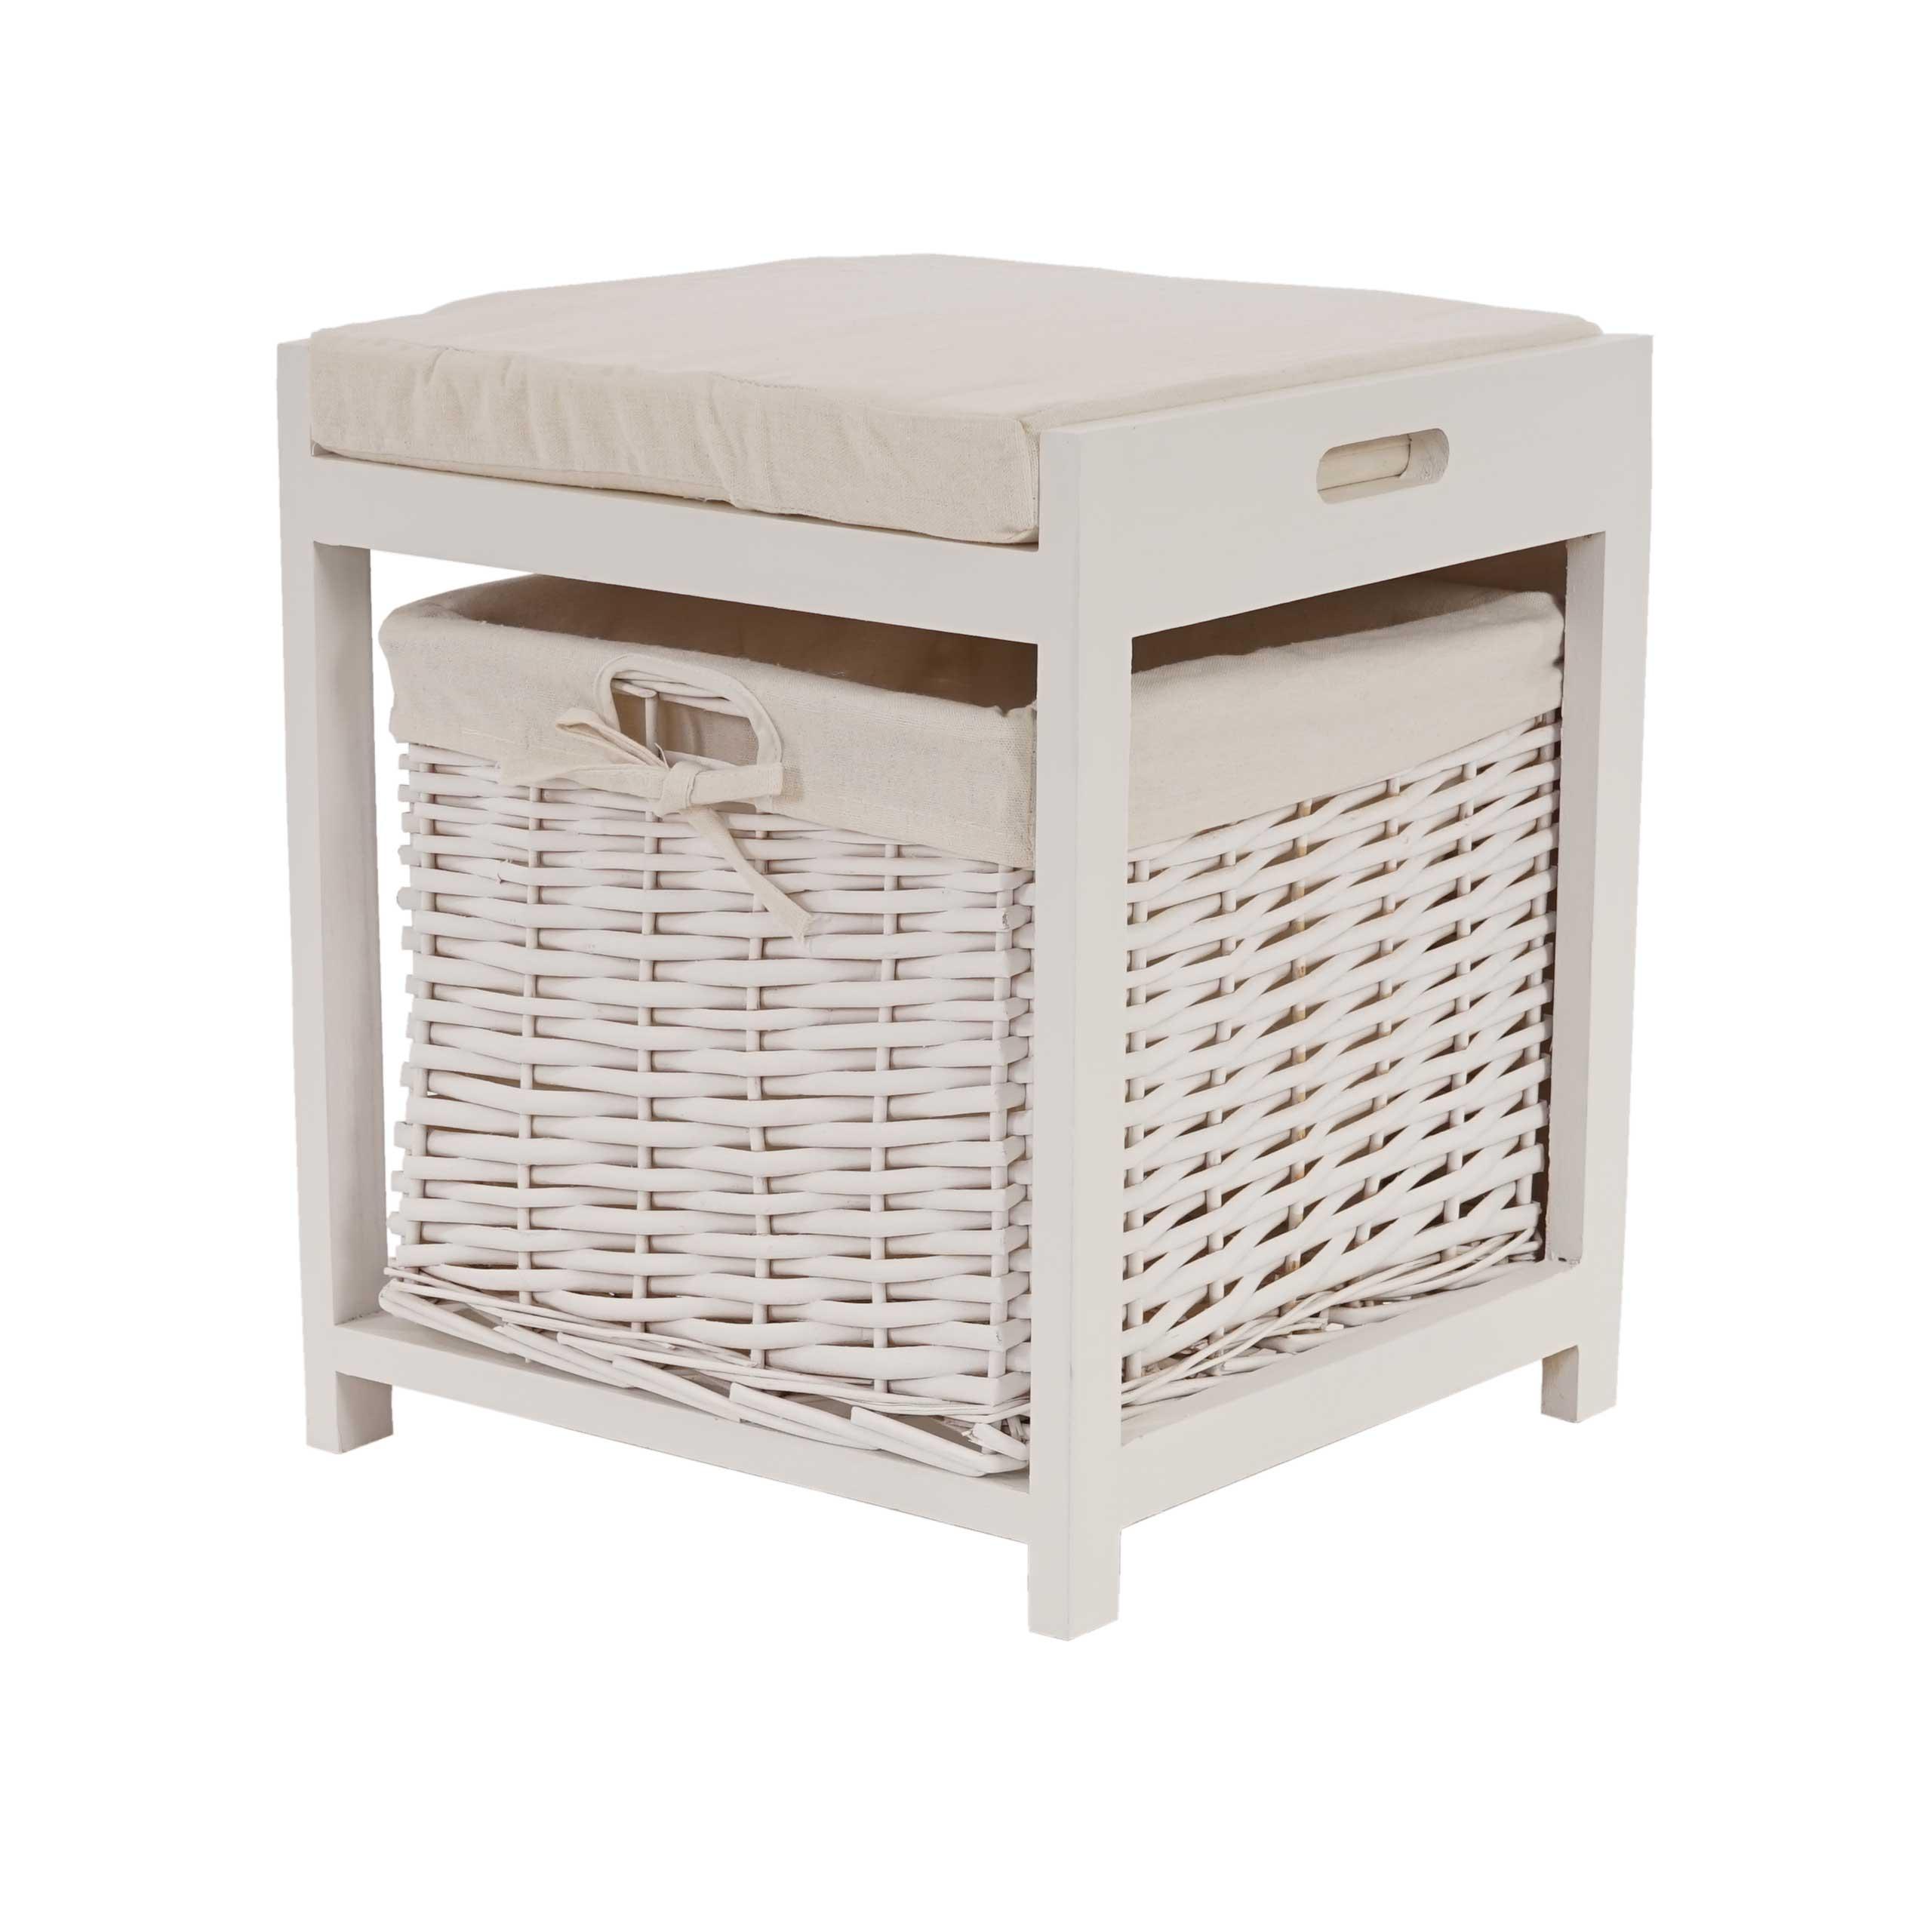 sitzhocker kelibia hocker sitzbox korb aufbewahrung. Black Bedroom Furniture Sets. Home Design Ideas